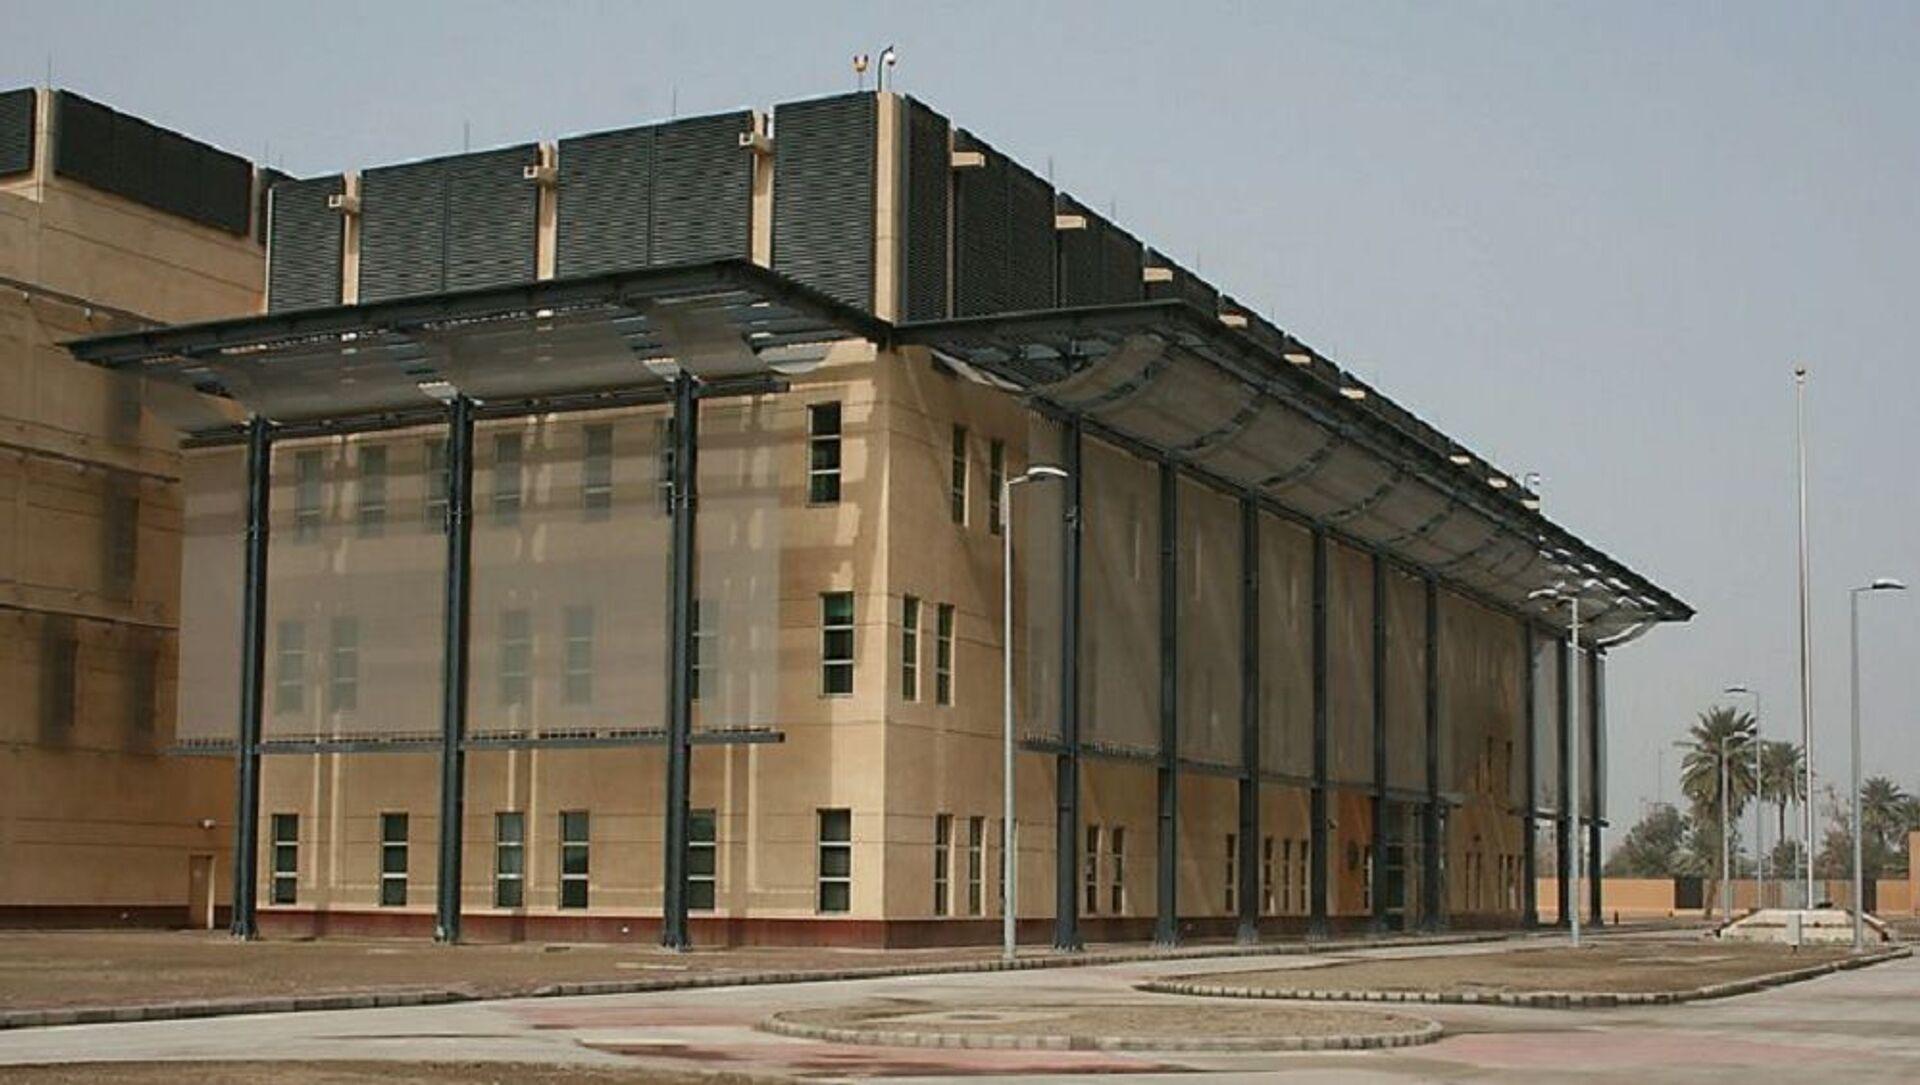 The new Embassy of the United States in Baghdad, Iraq - Sputnik Italia, 1920, 22.02.2021